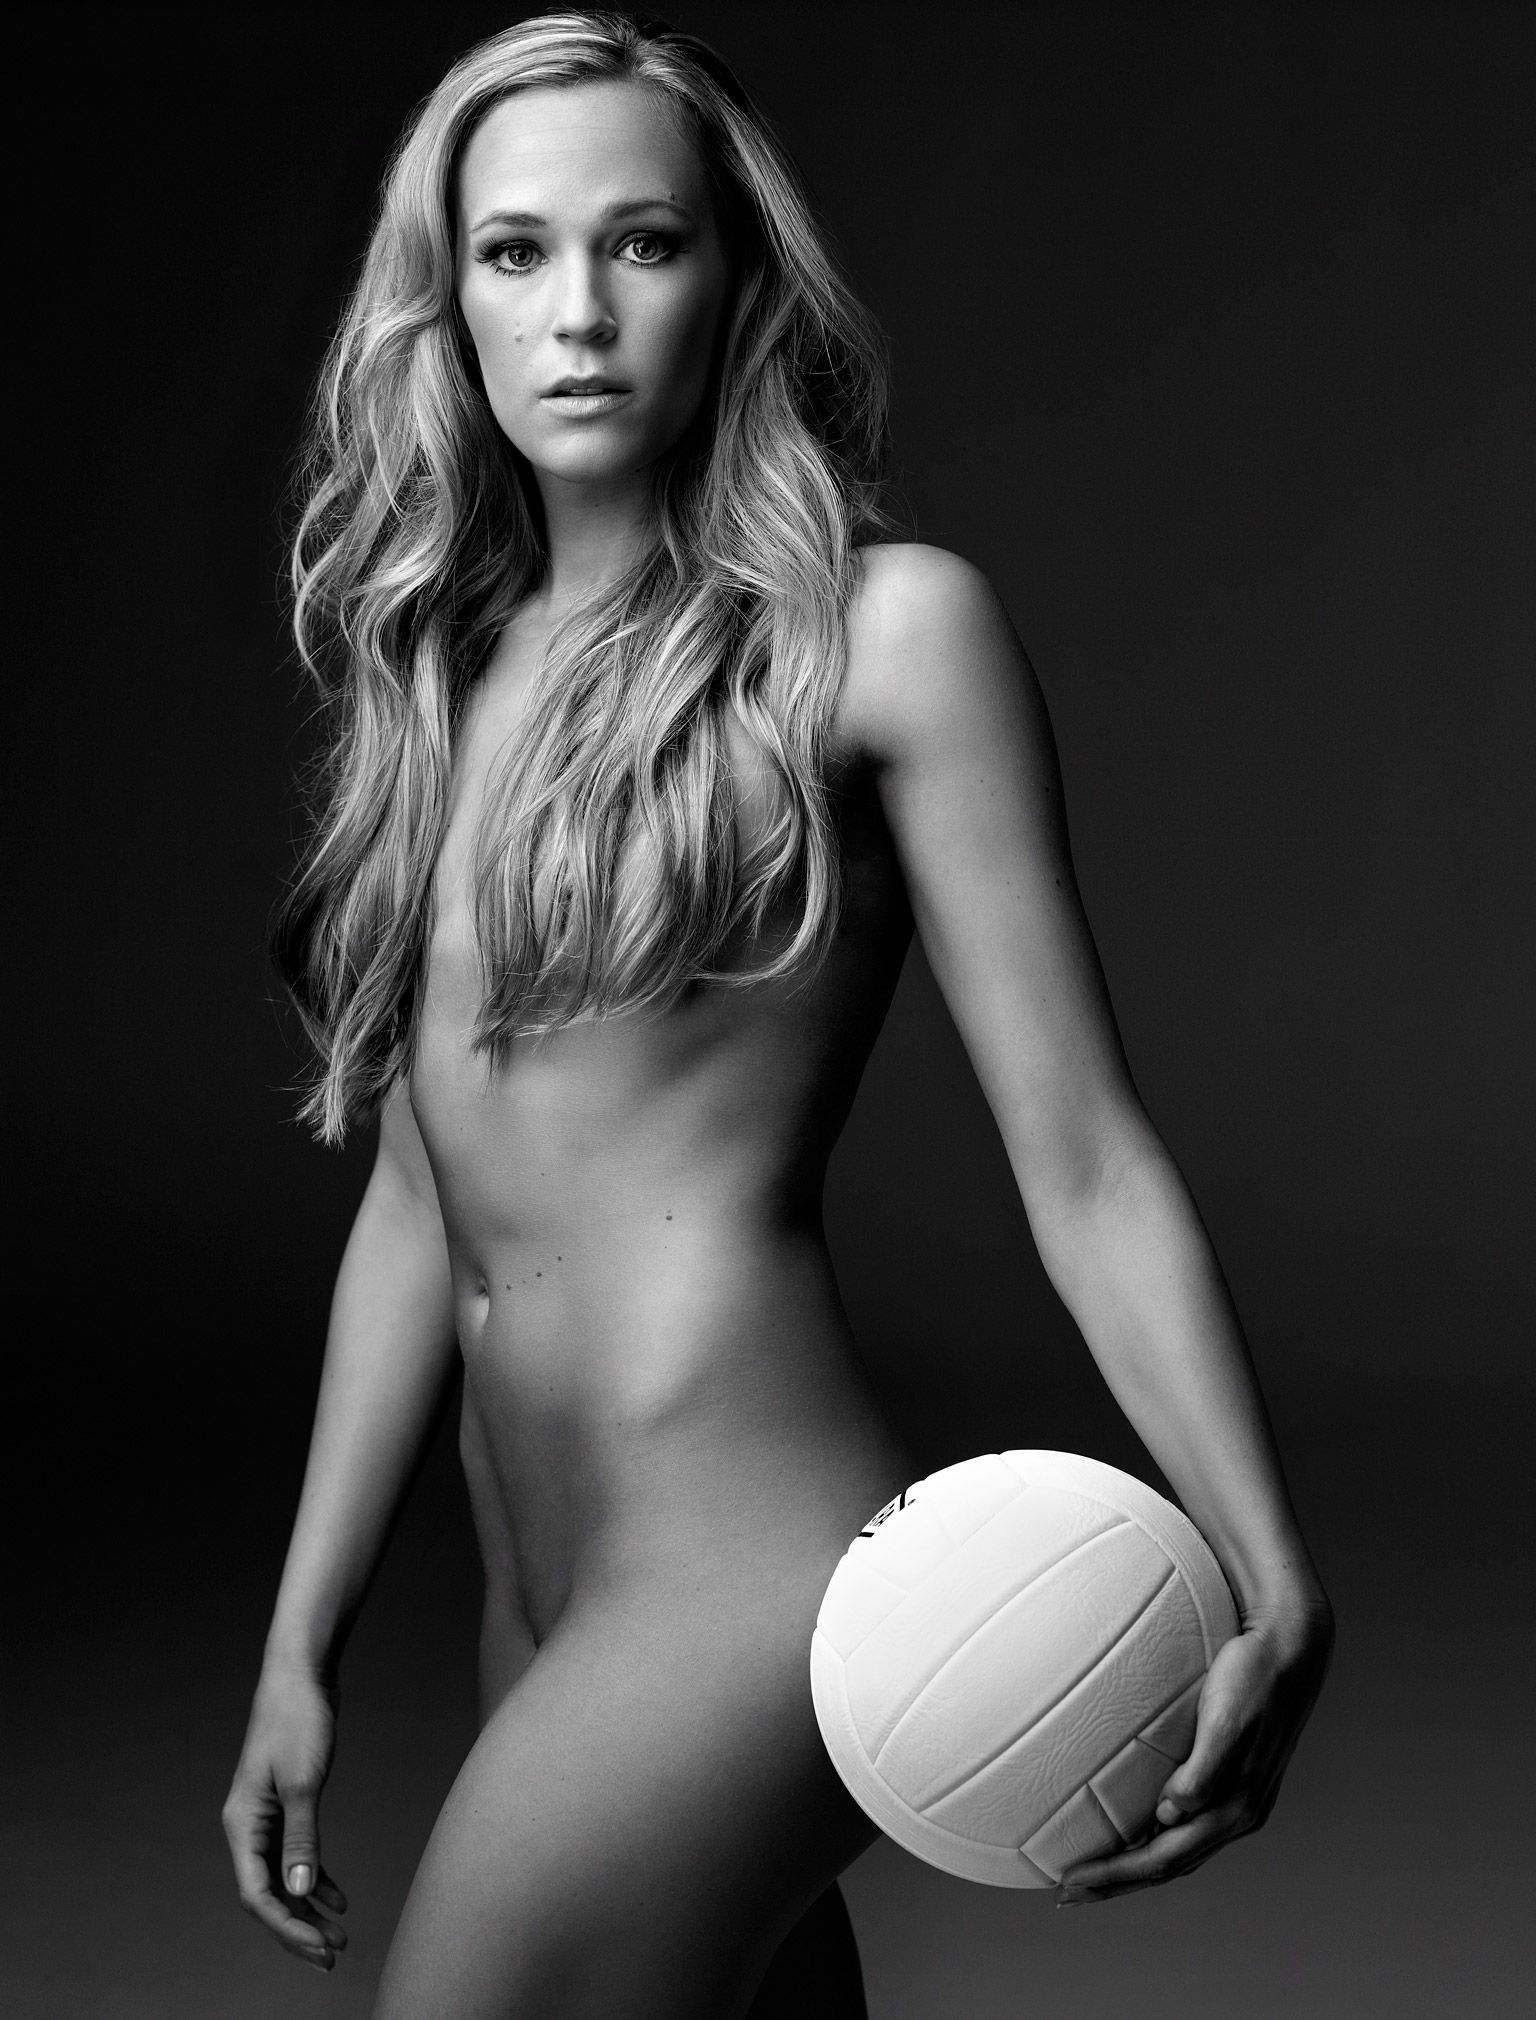 Hot marina sirtis nude mature naked